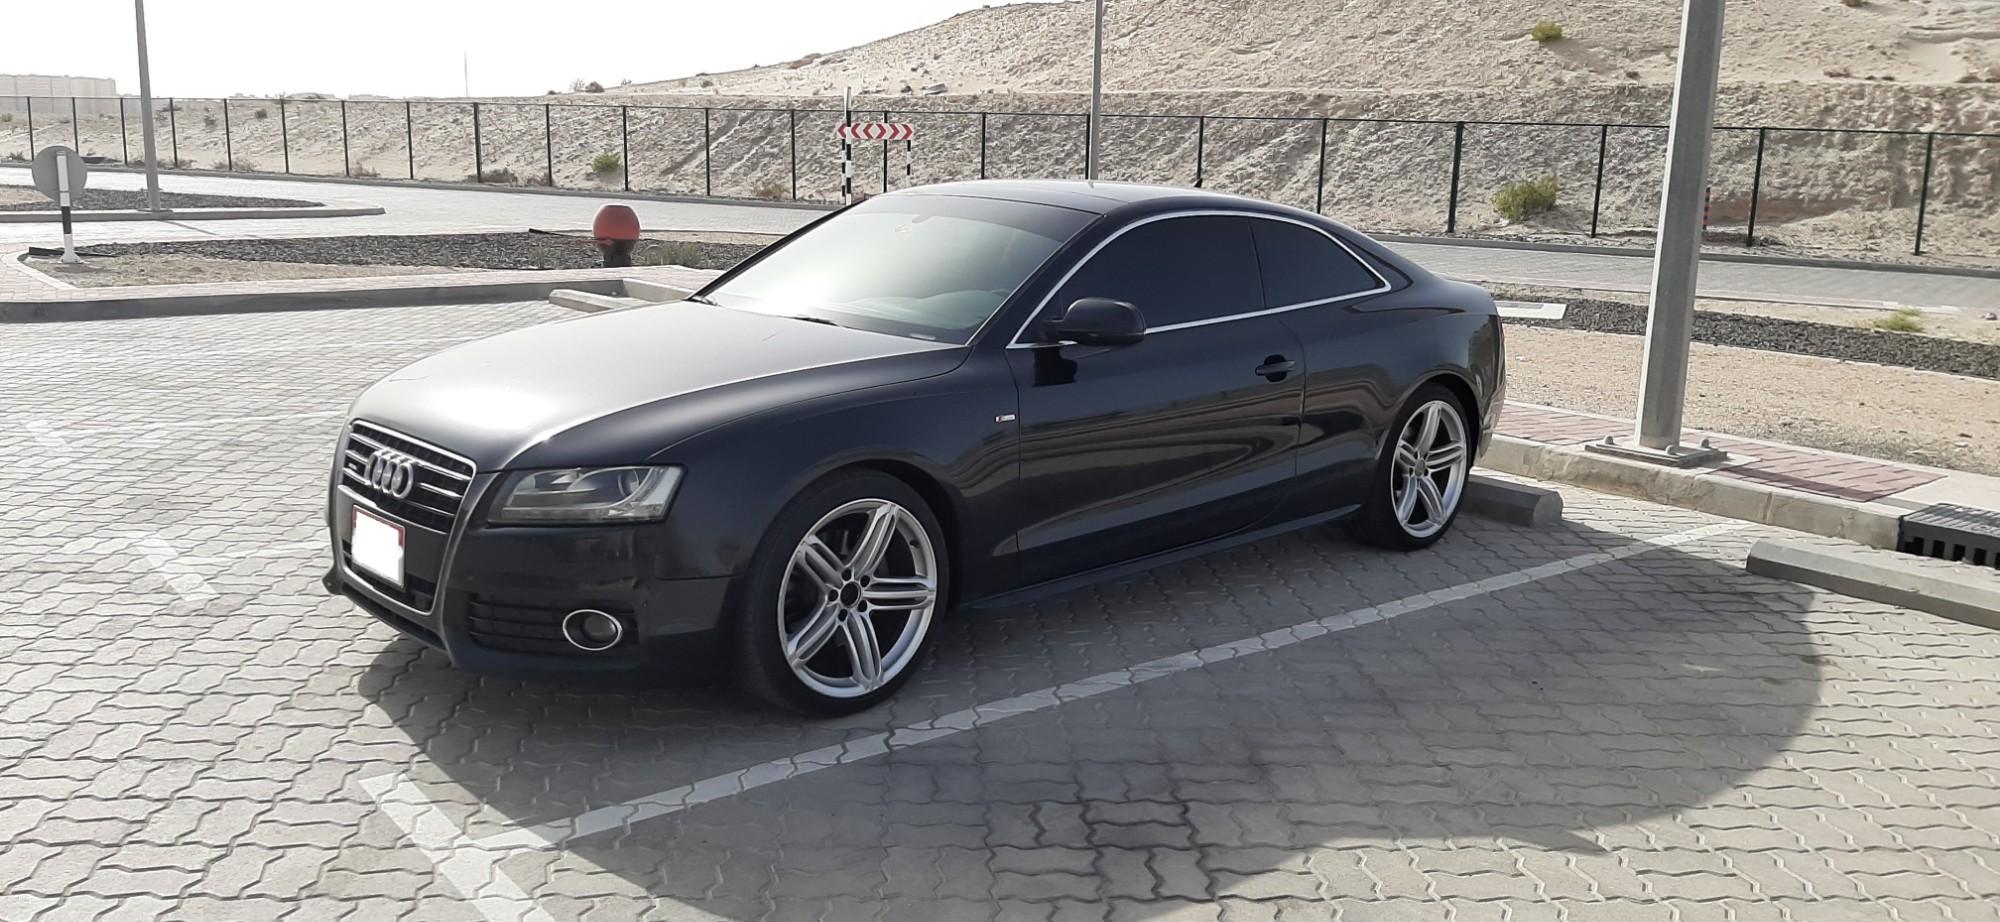 Kelebihan Kekurangan Audi A5 Coupe 2010 Review